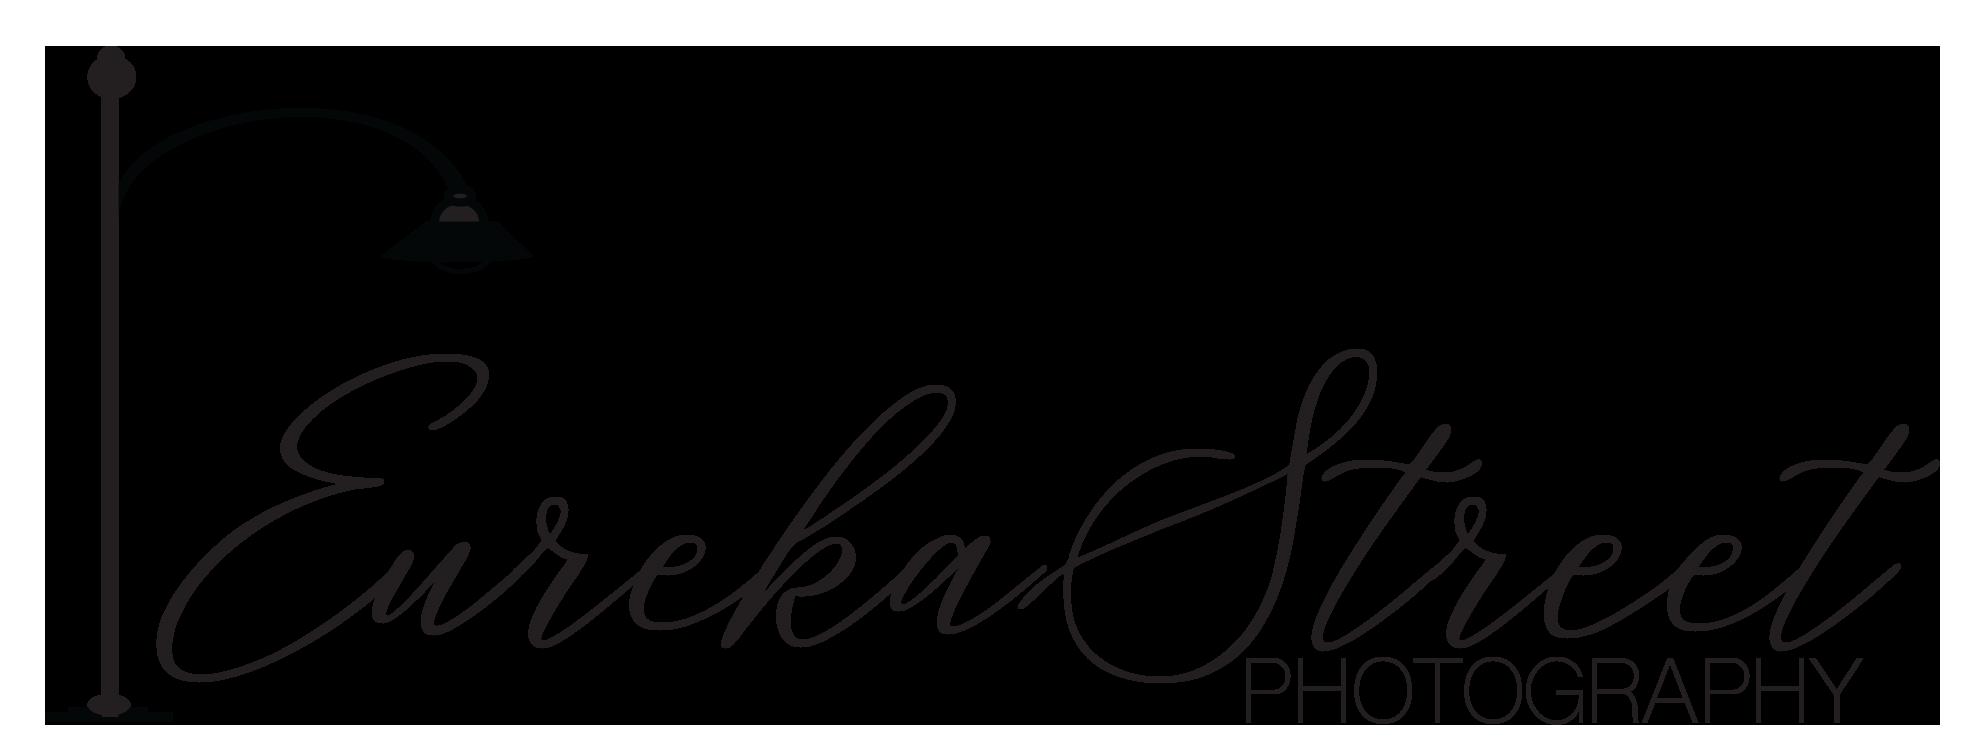 Eureka Street Photography